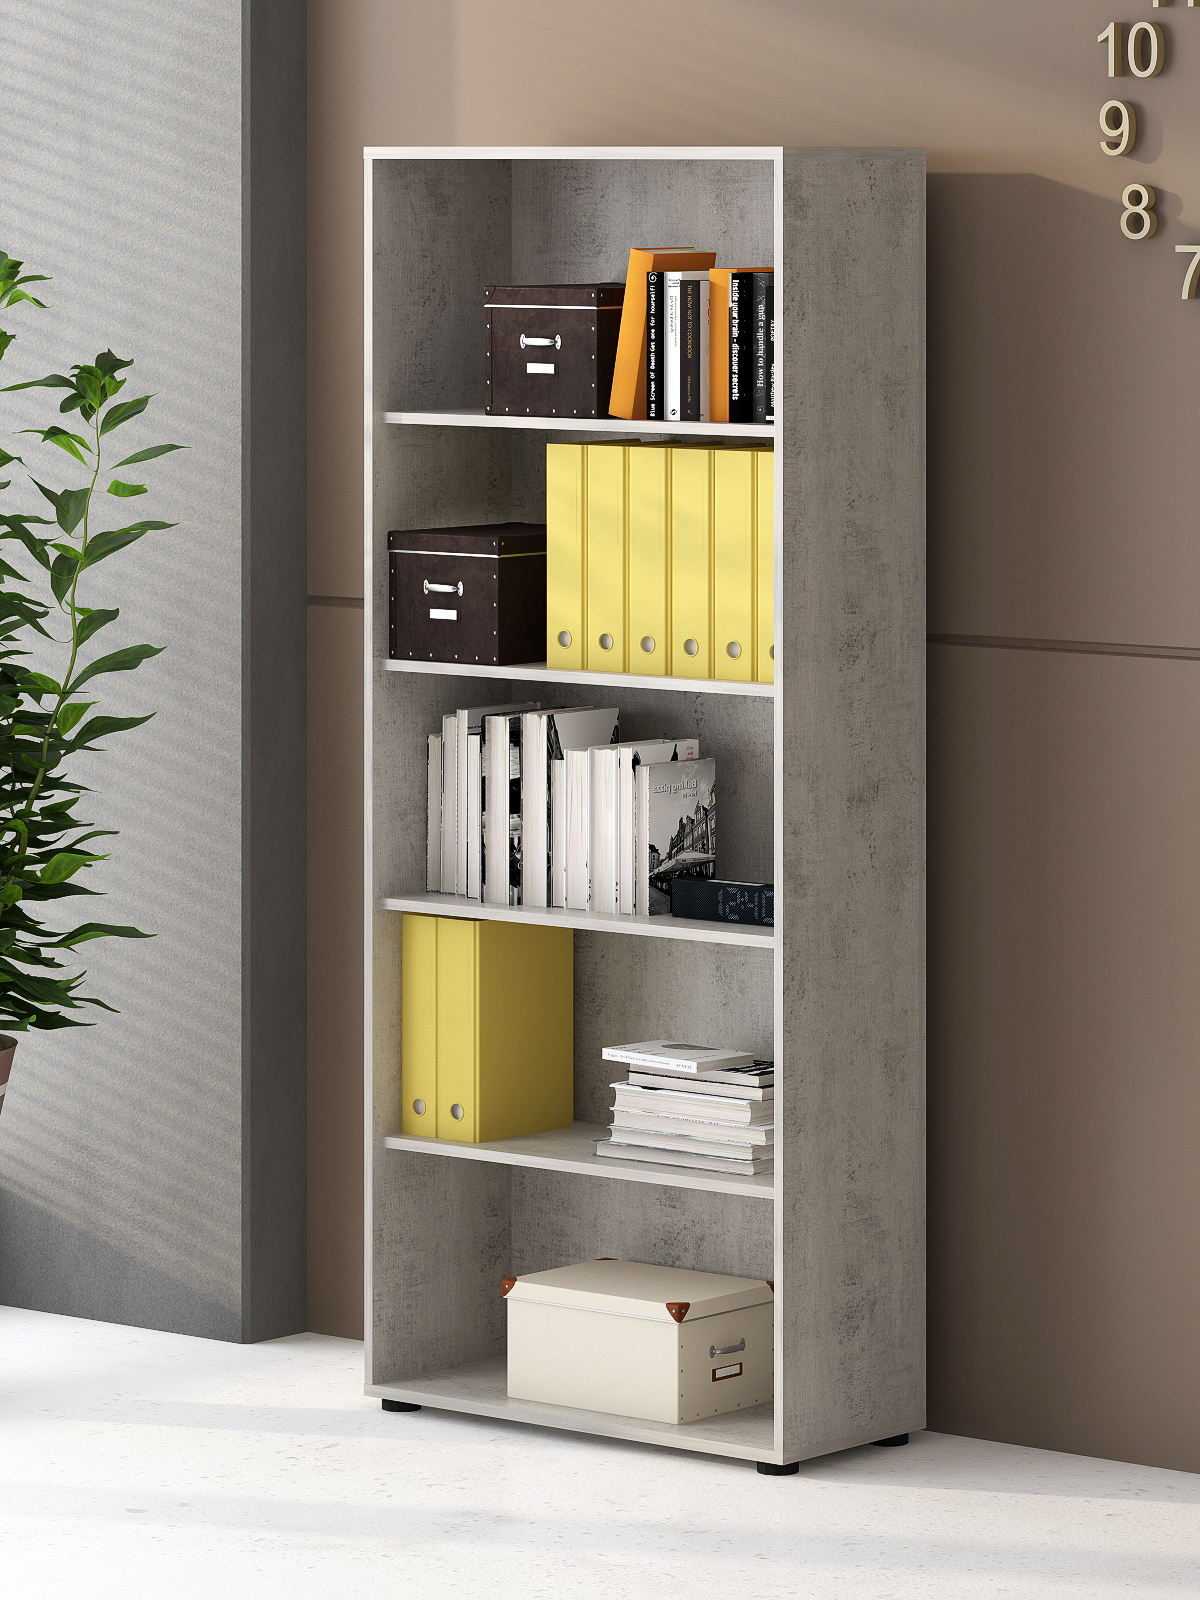 Regal Aktenregal Bücherregal Bücherboard 22188BO3 Beton & Weiß matt Dekor